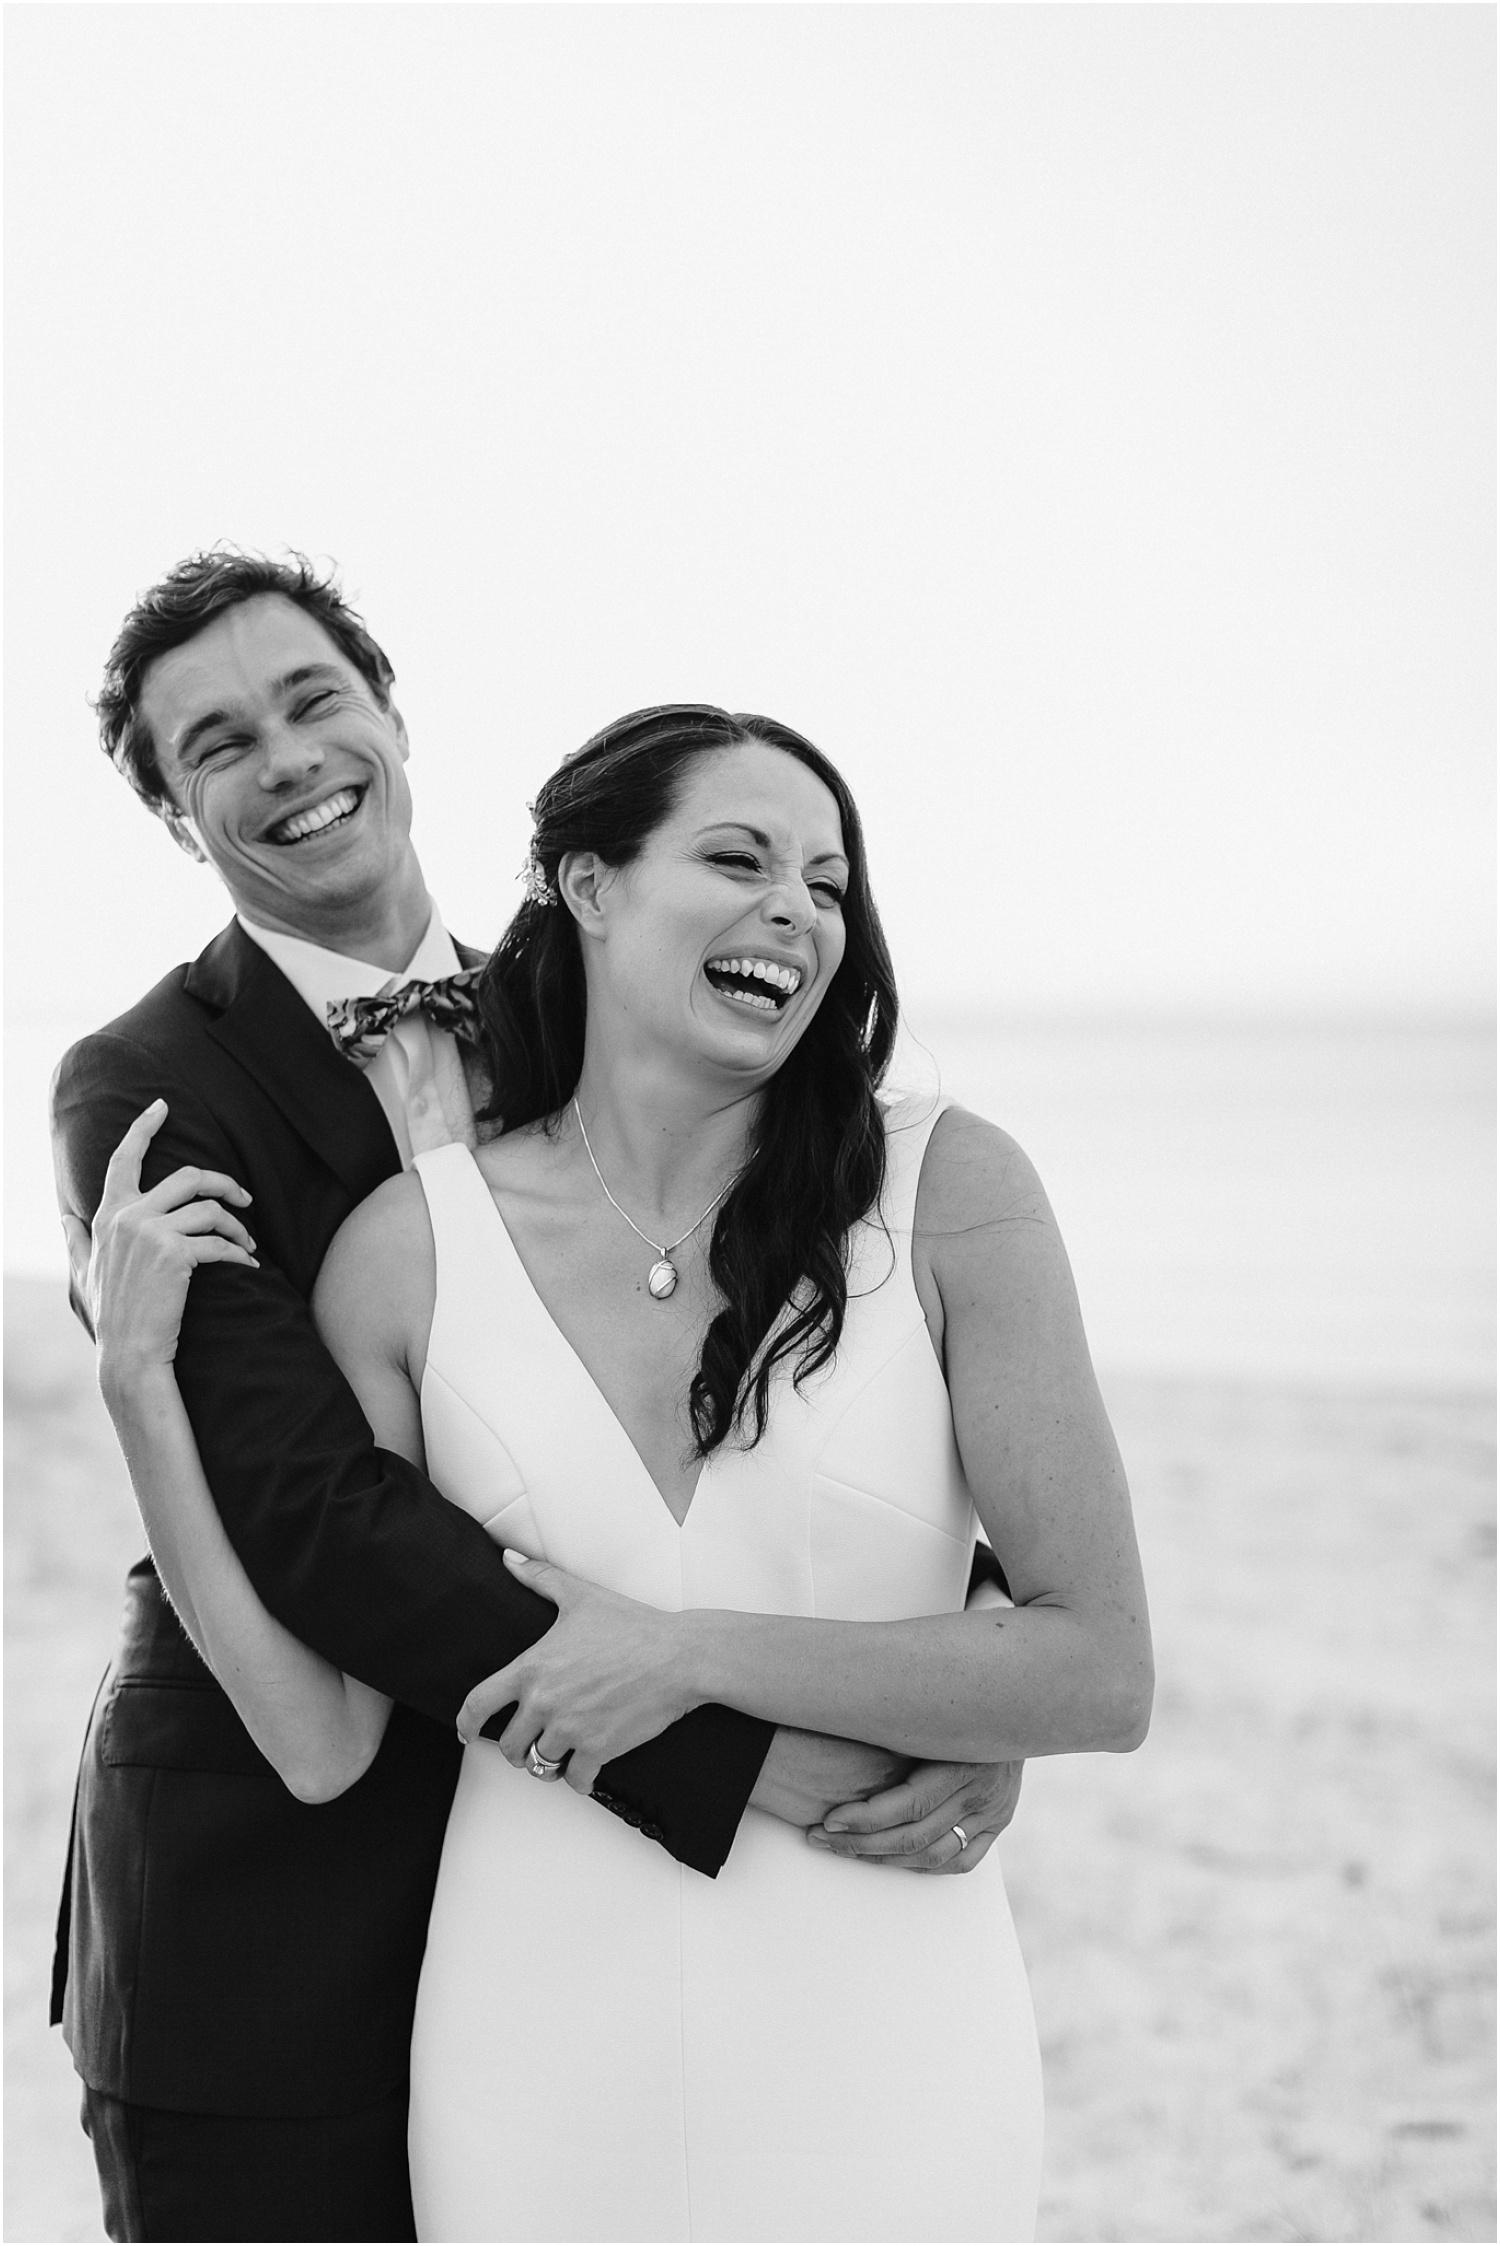 Belinda and Hugh at Alatanero on the Mornigton Peninsula._0089.jpg